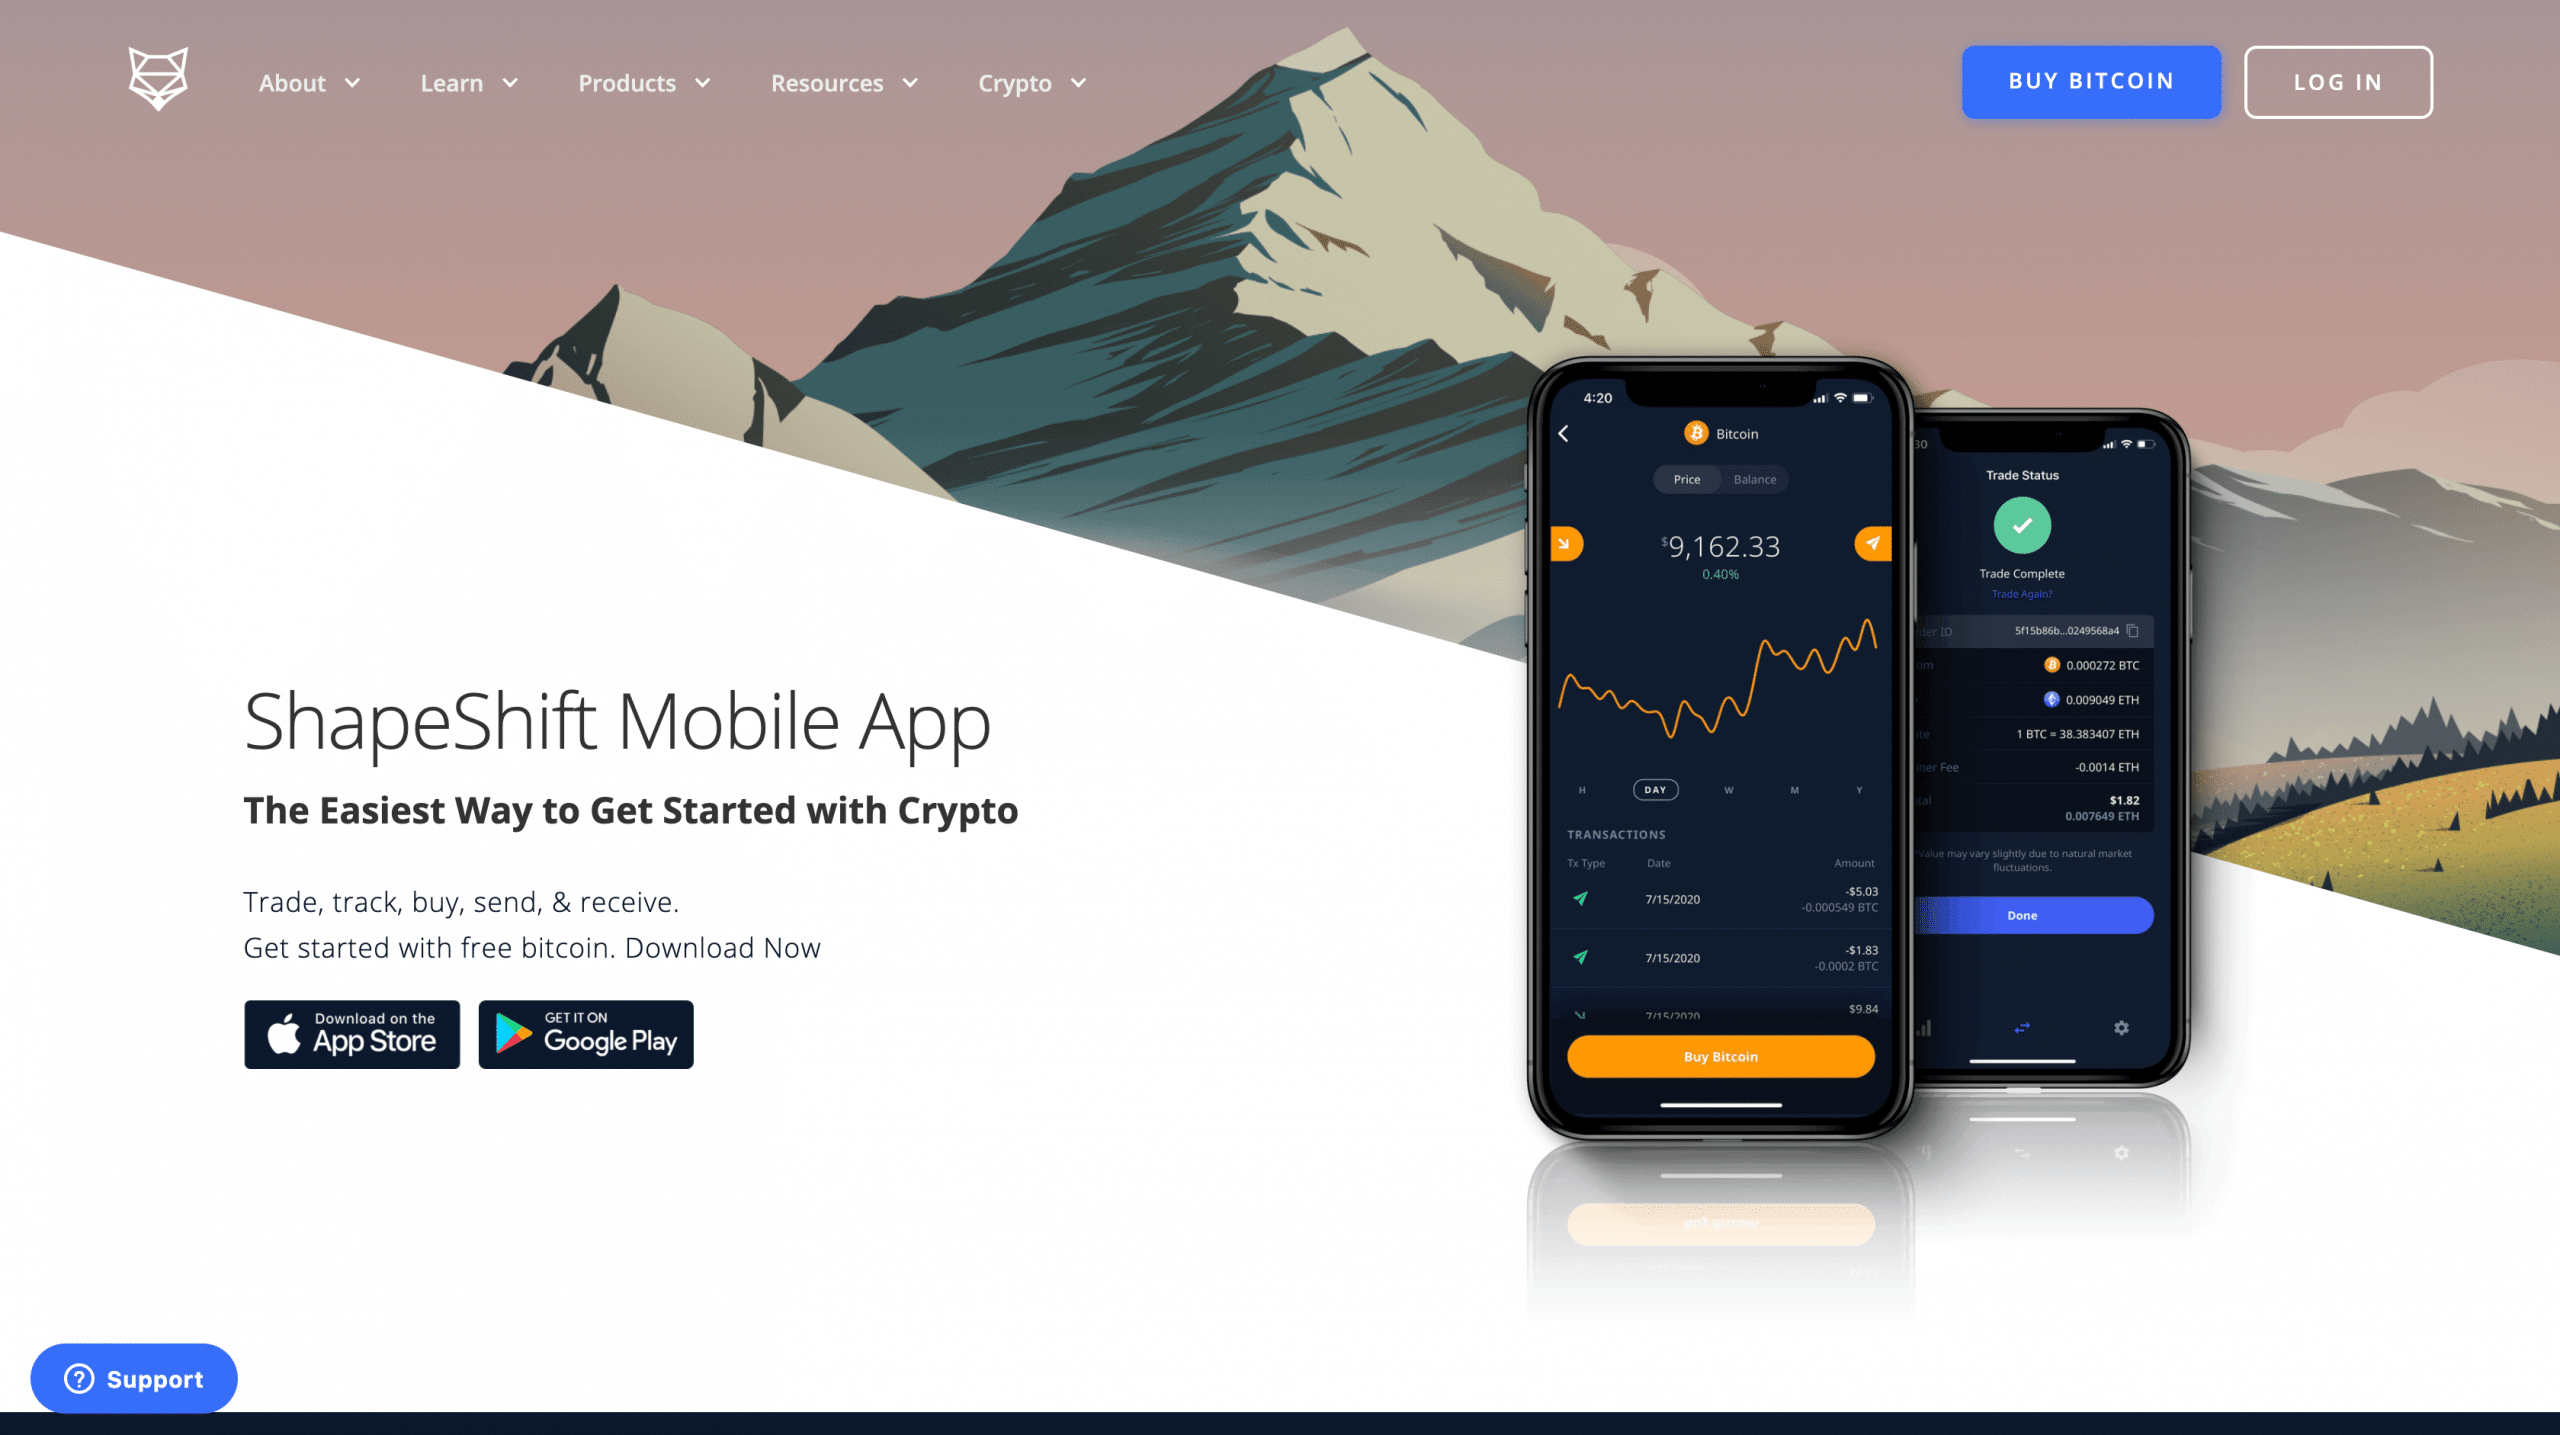 Shapeshift App